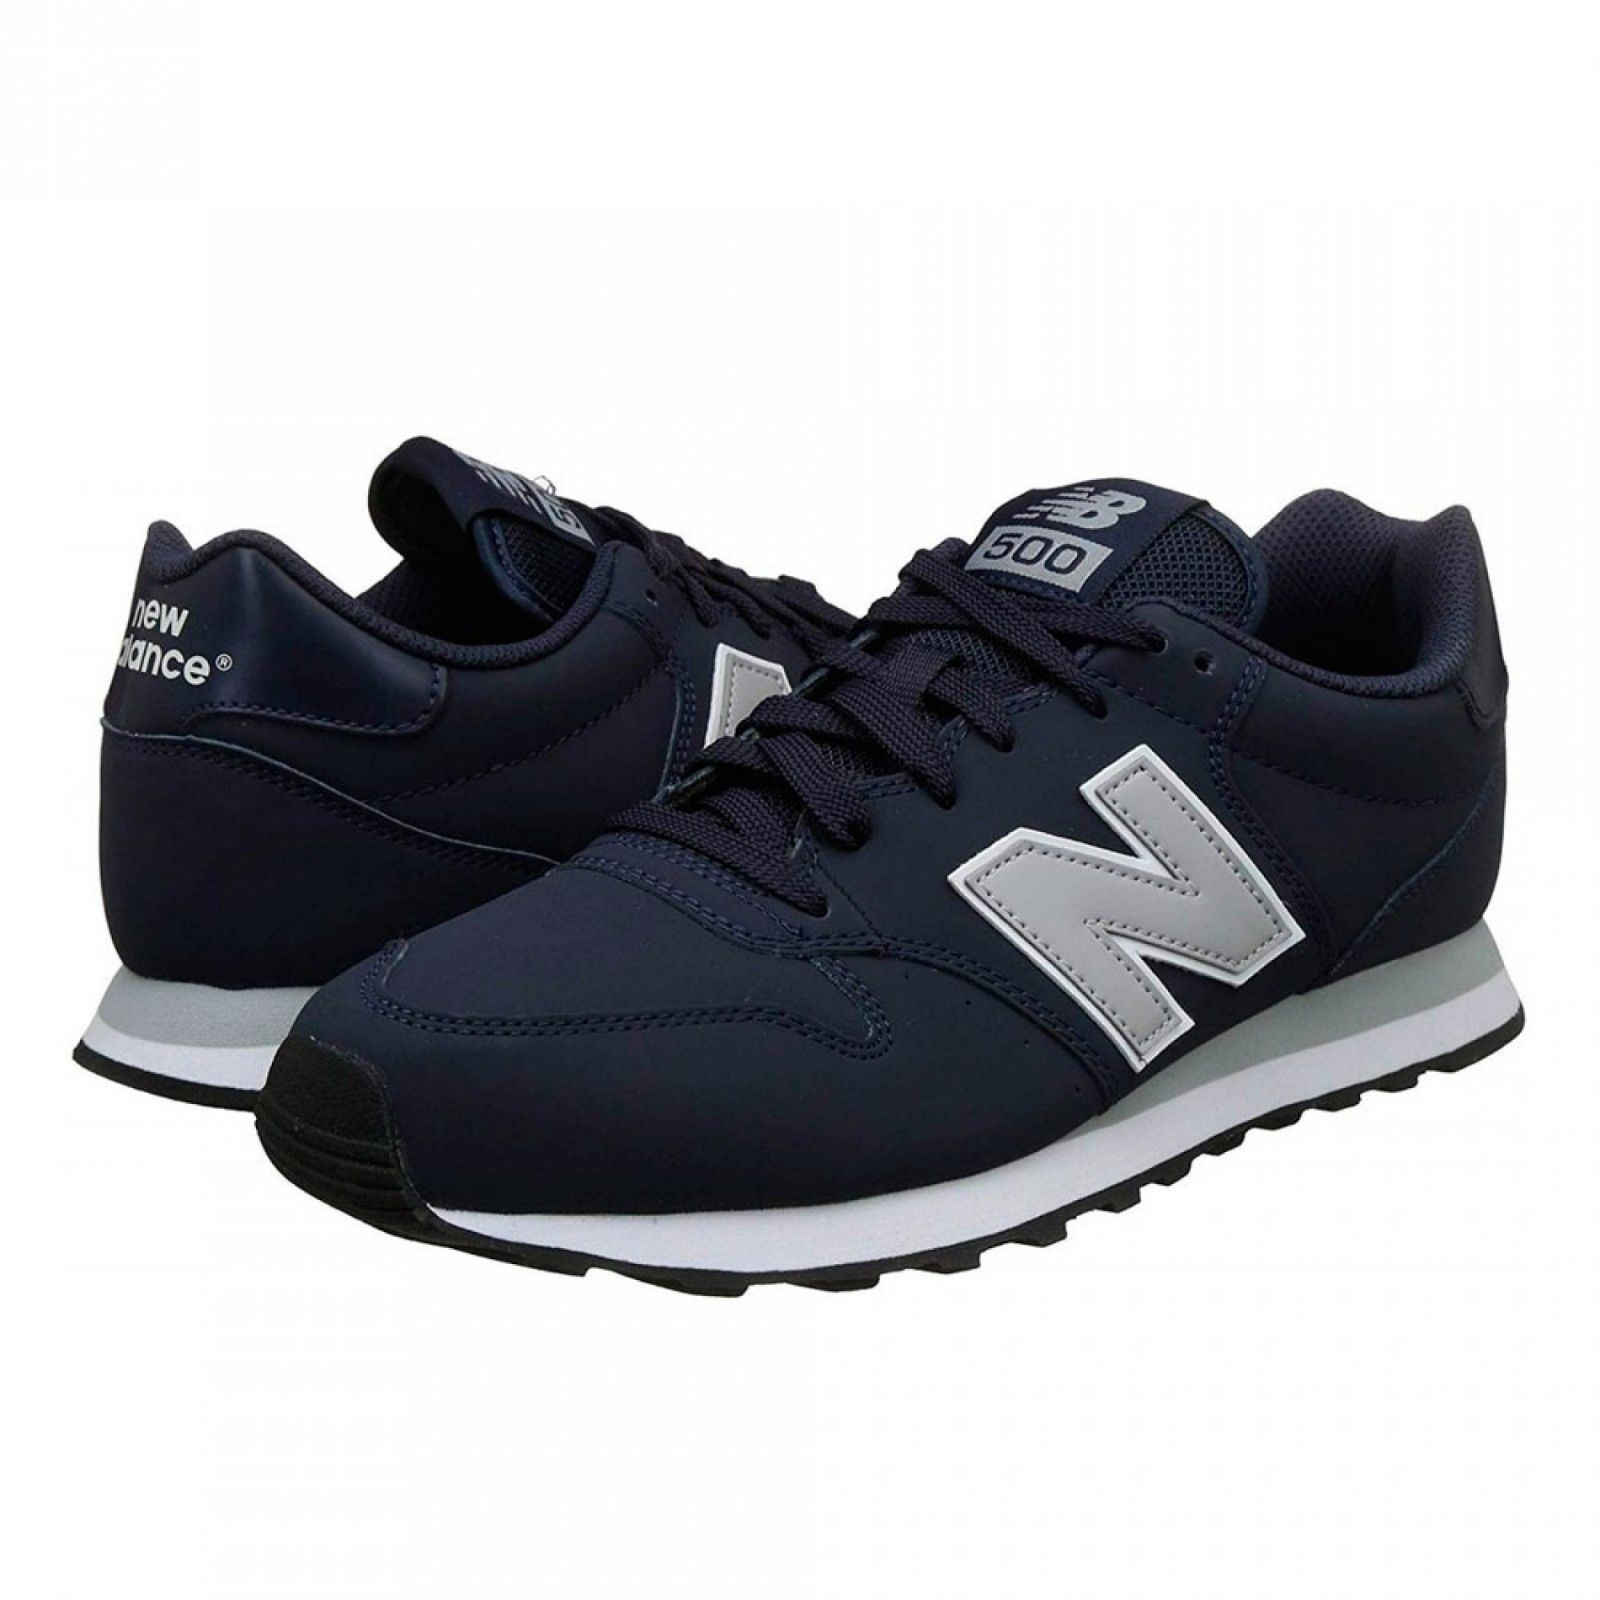 New Balance 500 Navy Blue GM500NAG Mens Running Shoes Size 11.5